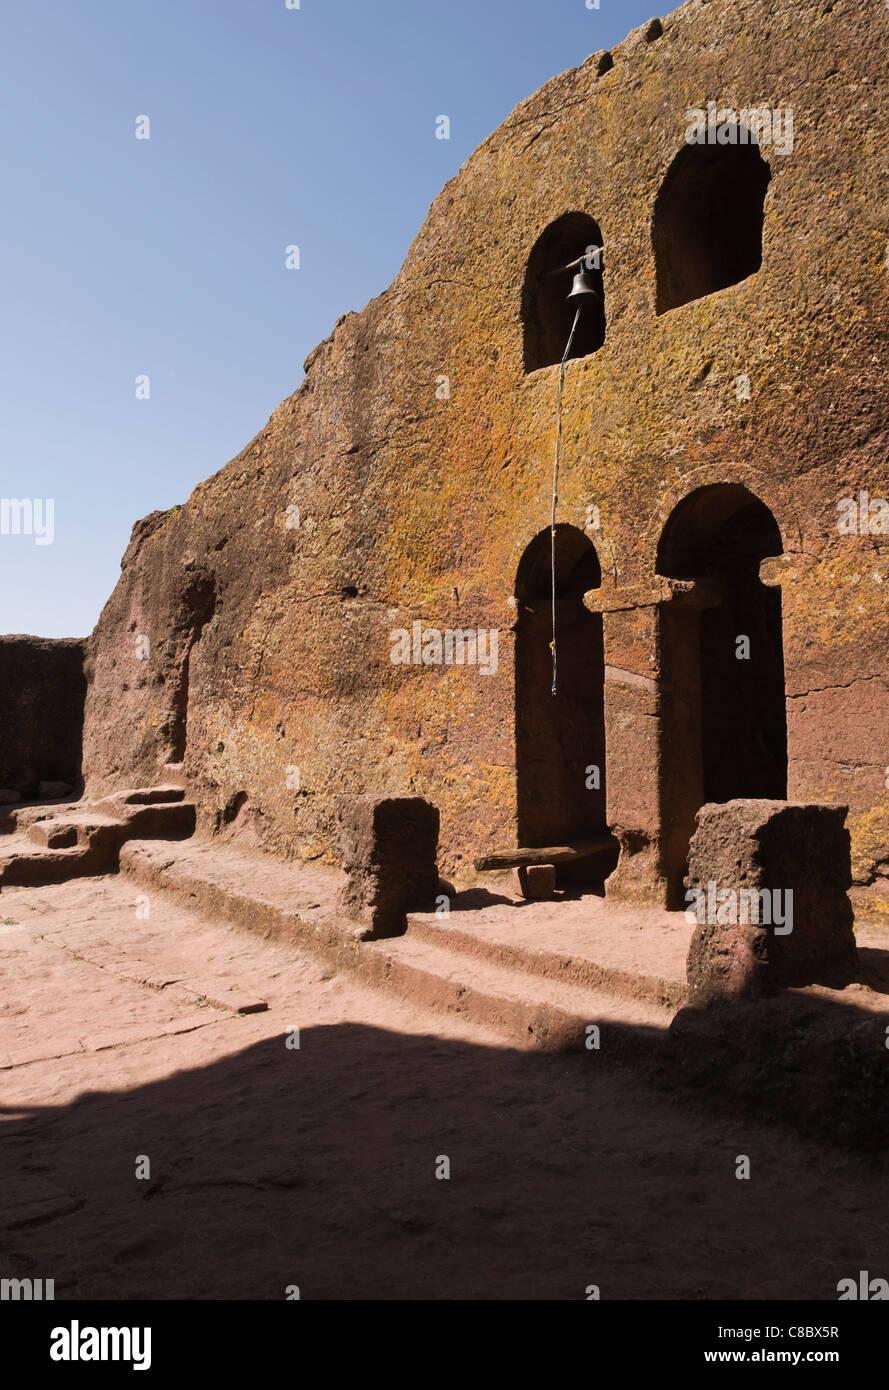 Elk200-3154v Ethiopia, Lalibela, rock cut church, 12th-13th c, Bet Maryam - Stock Image